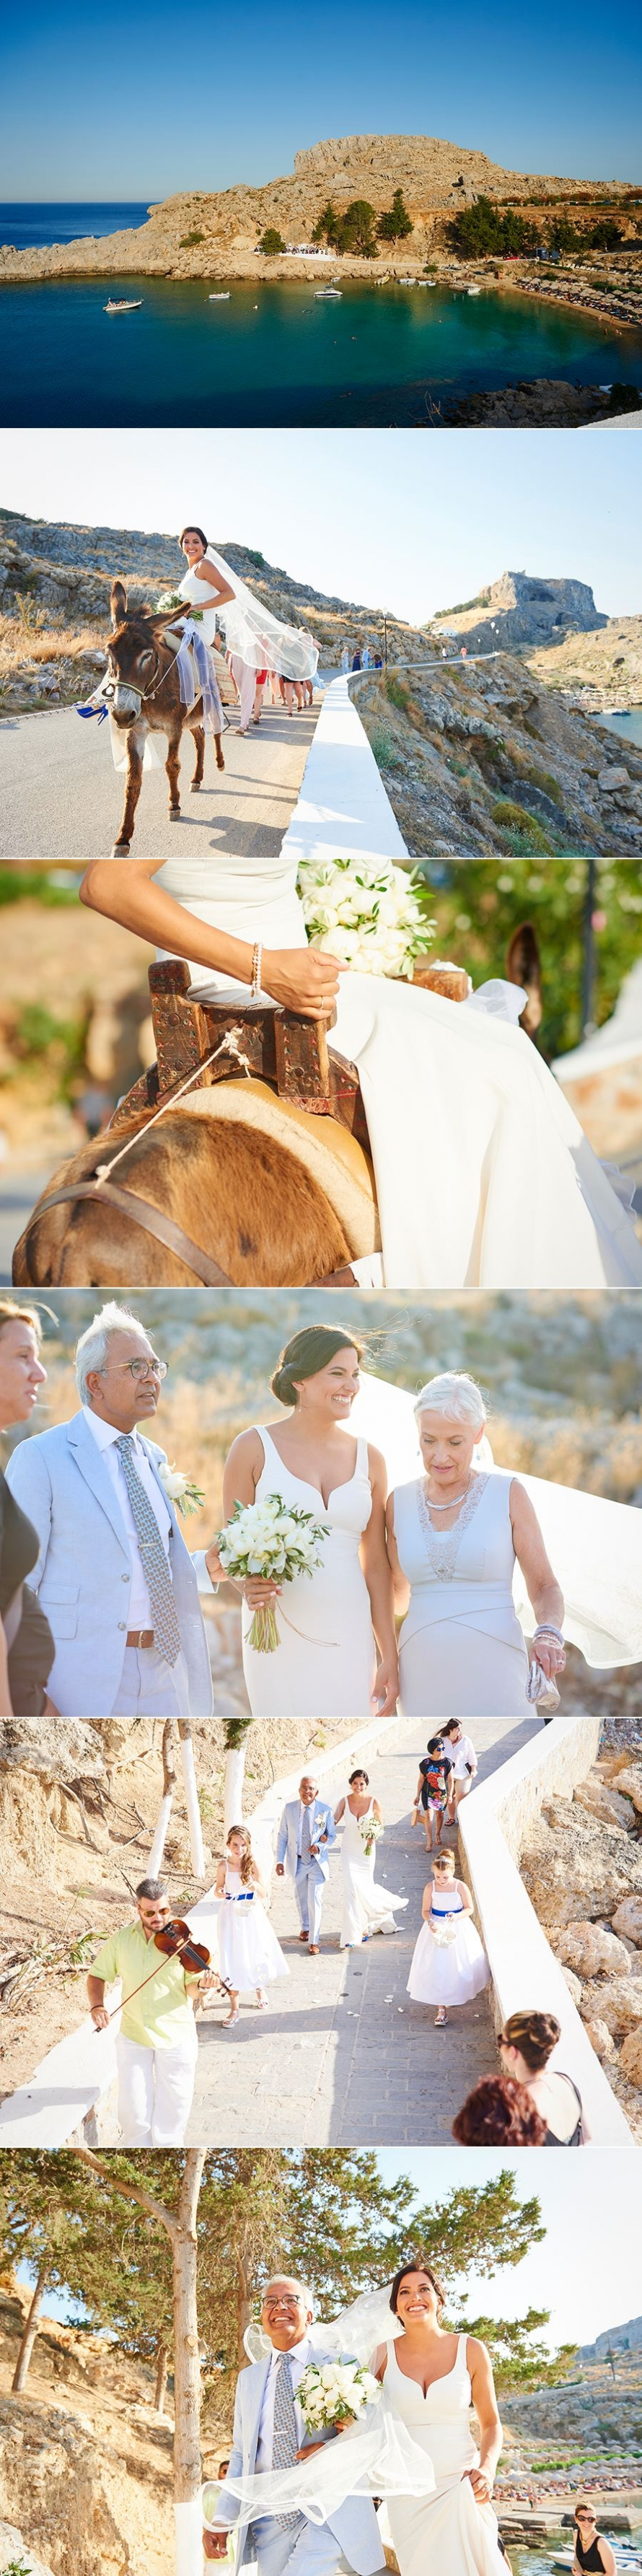 Nick Charlotte wedding 11